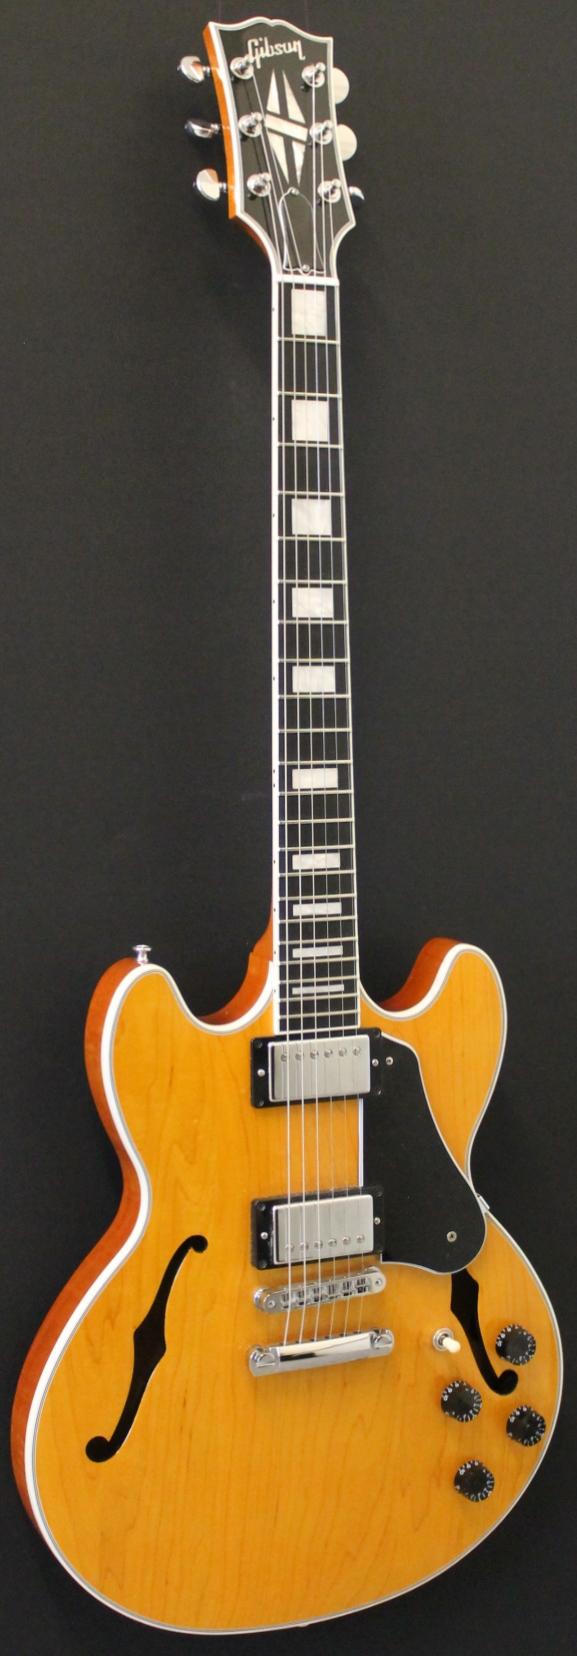 gibson midtown custom 2012 guitar for sale kitarakuu. Black Bedroom Furniture Sets. Home Design Ideas